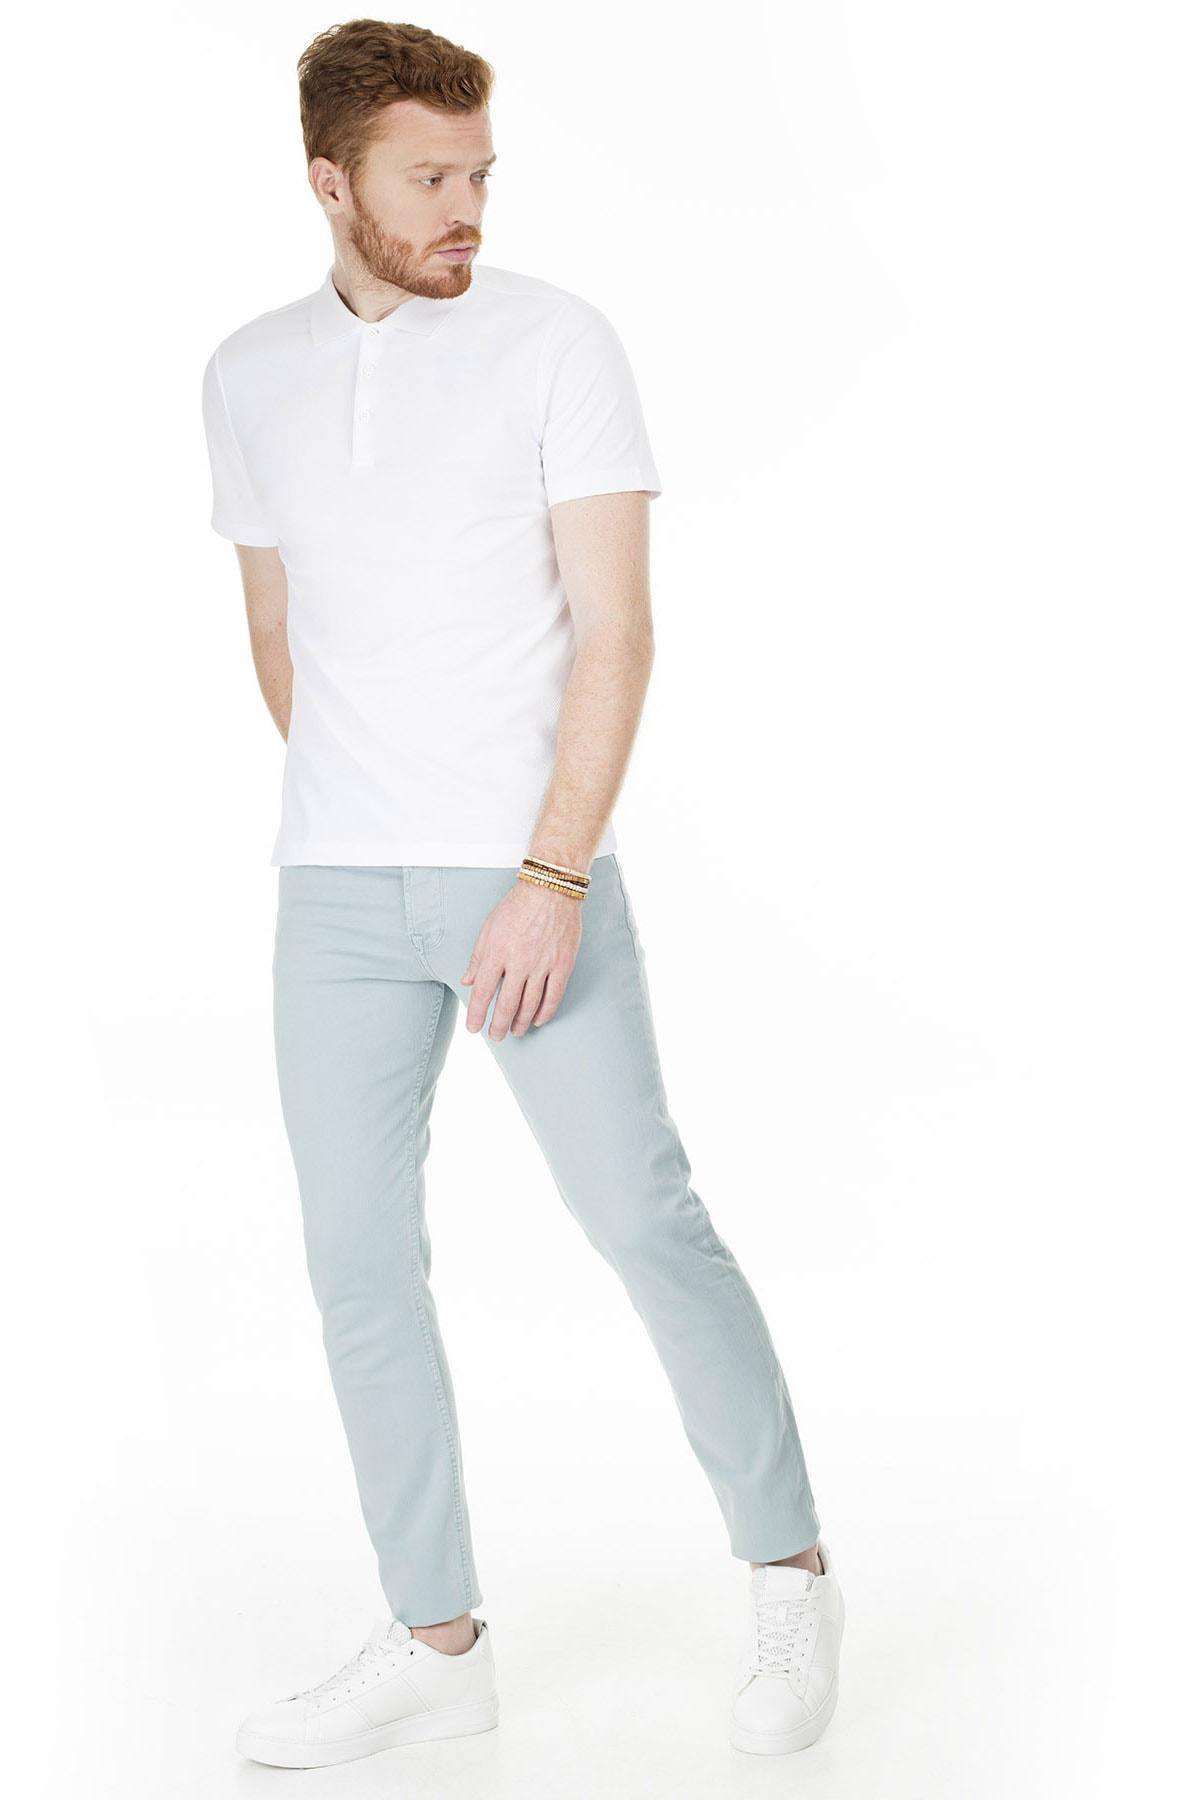 Buratti Erkek AÇIK MAVİ Normal Bel Dar Paça Slim Fit Jeans Pamuklu Kot Pantolon 7299F0287ARTOS 0